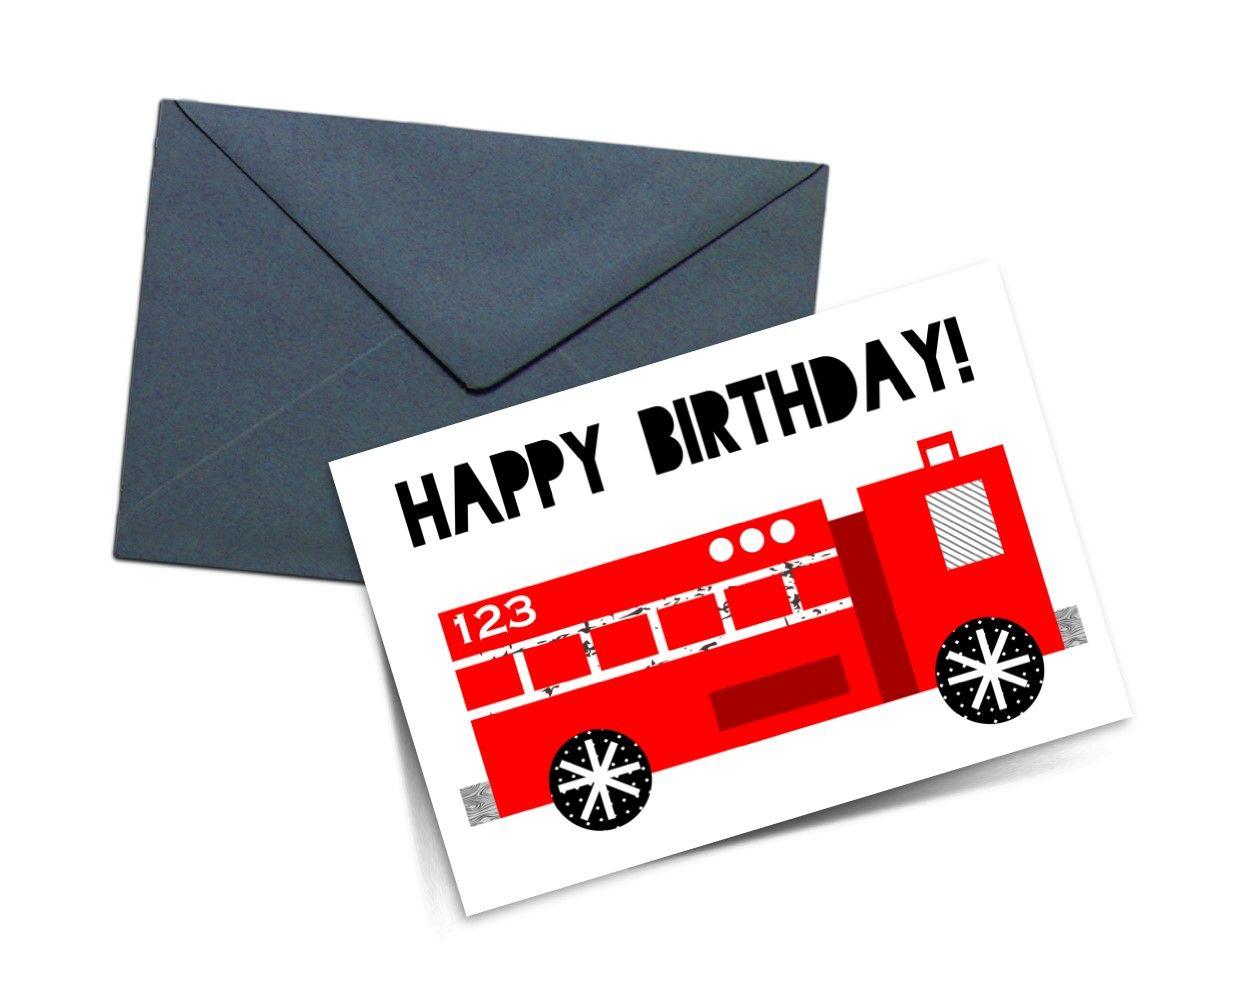 Happy Birthday Printable ~ Printable birthday card happy printable birthday funny